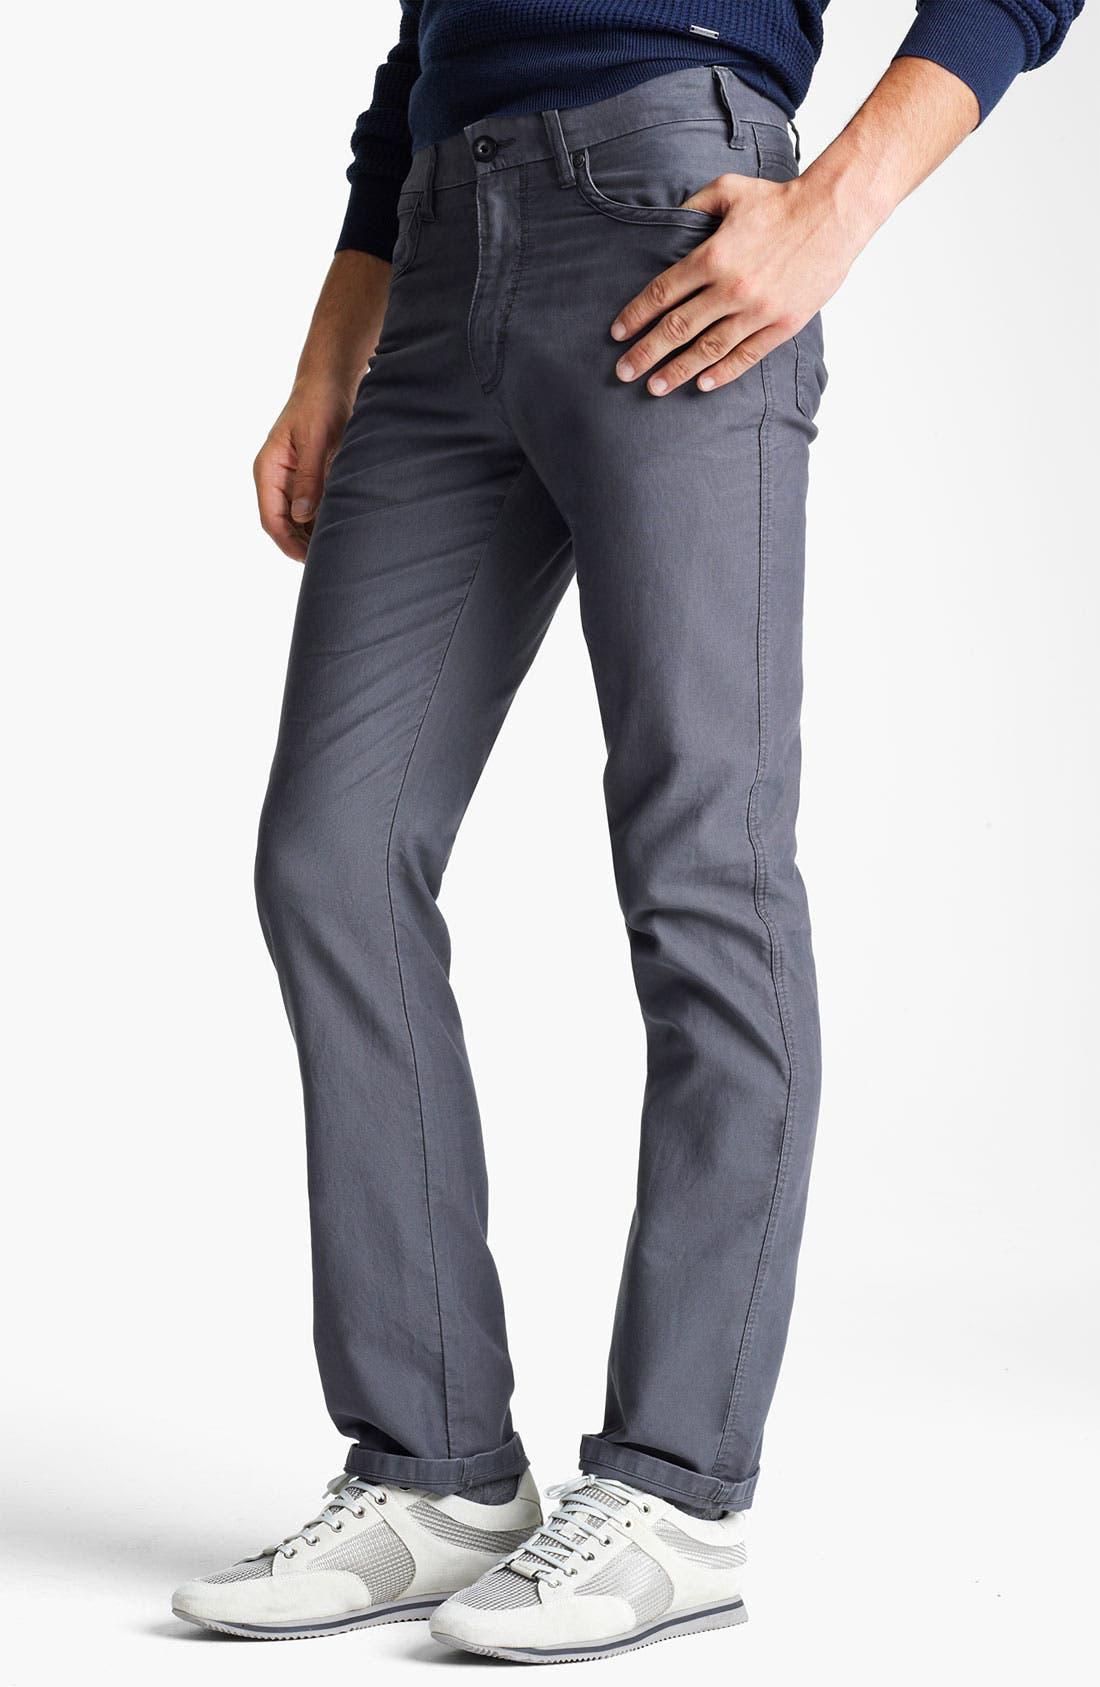 Alternate Image 1 Selected - Zegna Sport Five Pocket Cotton Pants